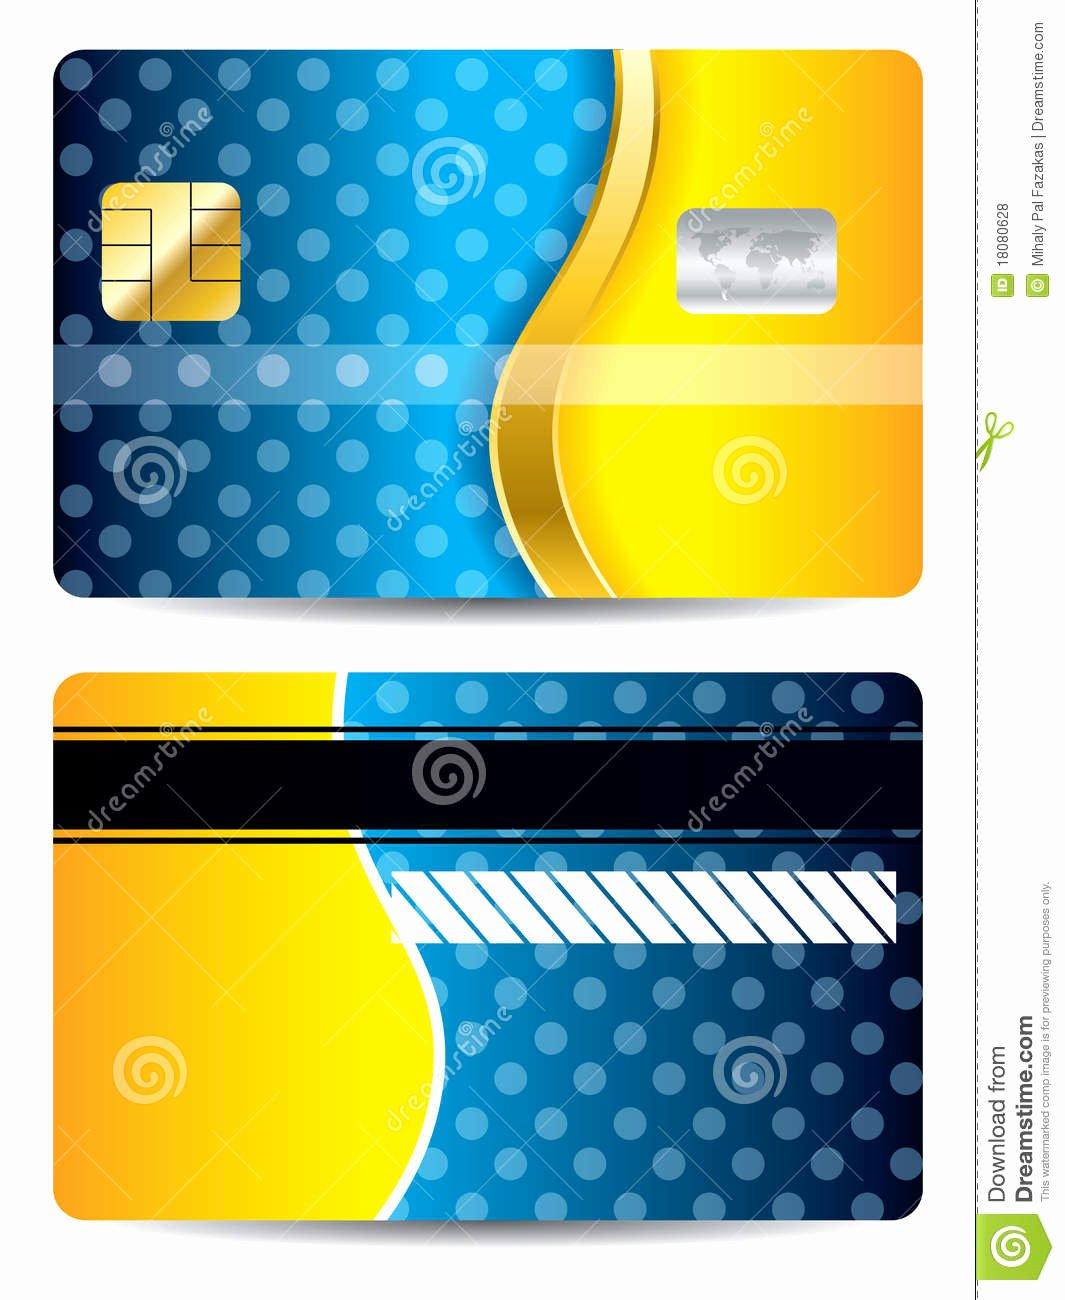 Cool Debit Card Designs Elegant Cool Blue and orange Credit Card Stock Vector